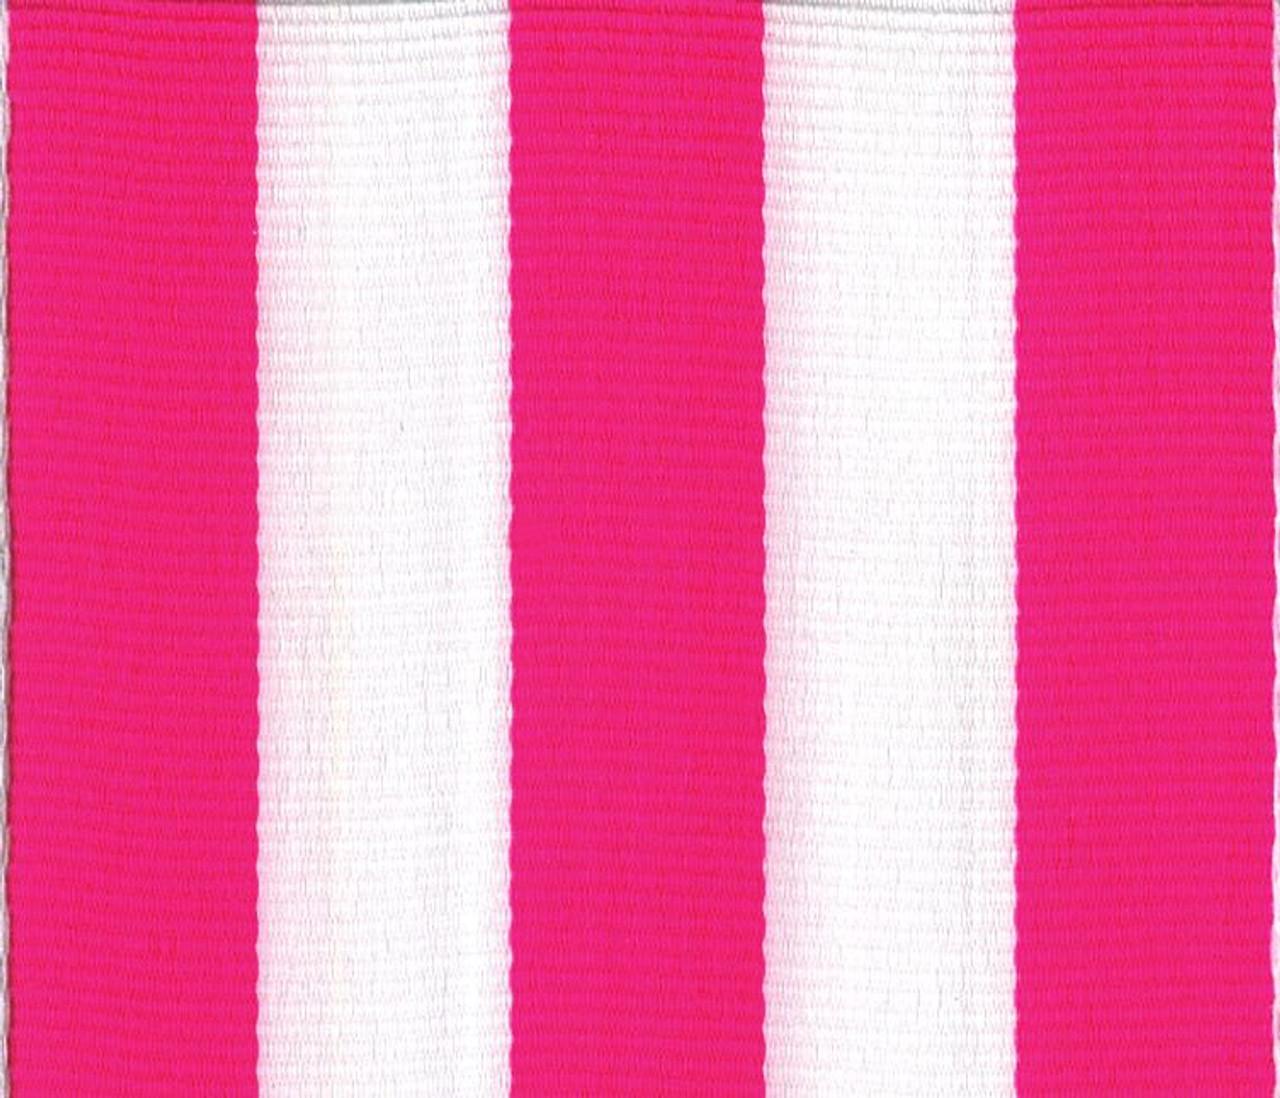 Pink Striped Grosgrain Ribbon